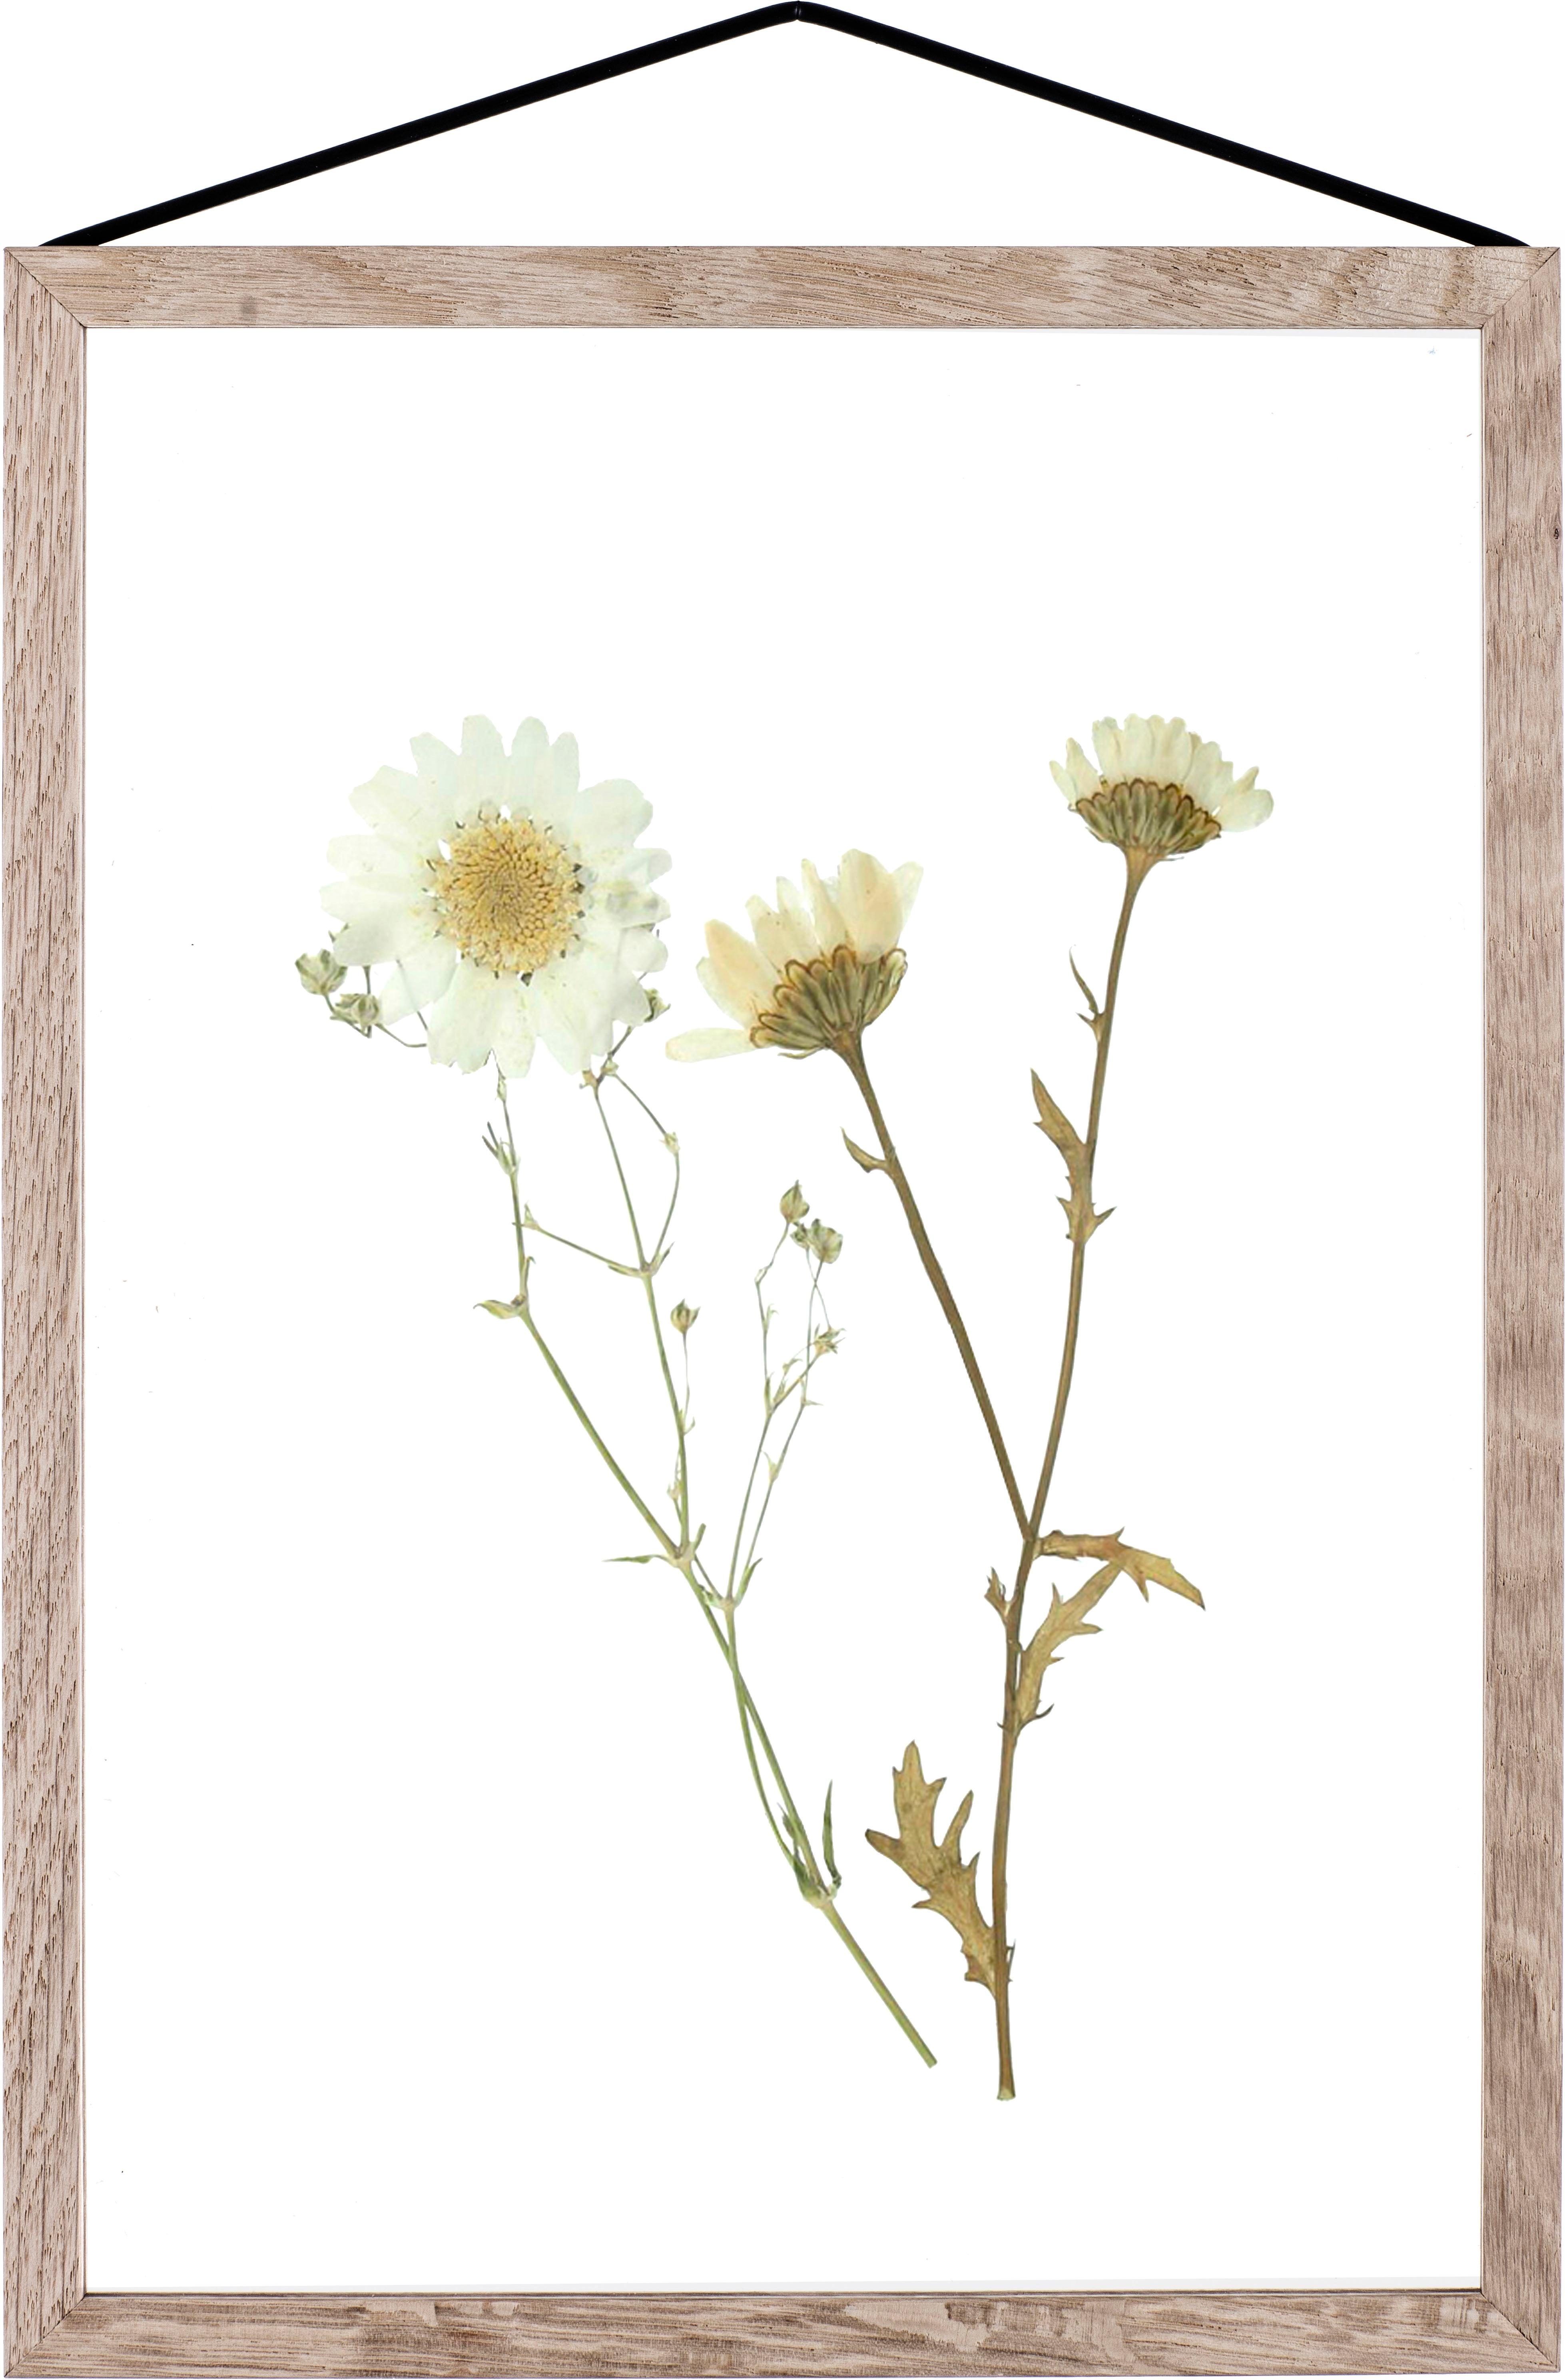 Marco Frame, Roble, negro, An 23 x Al 31 cm